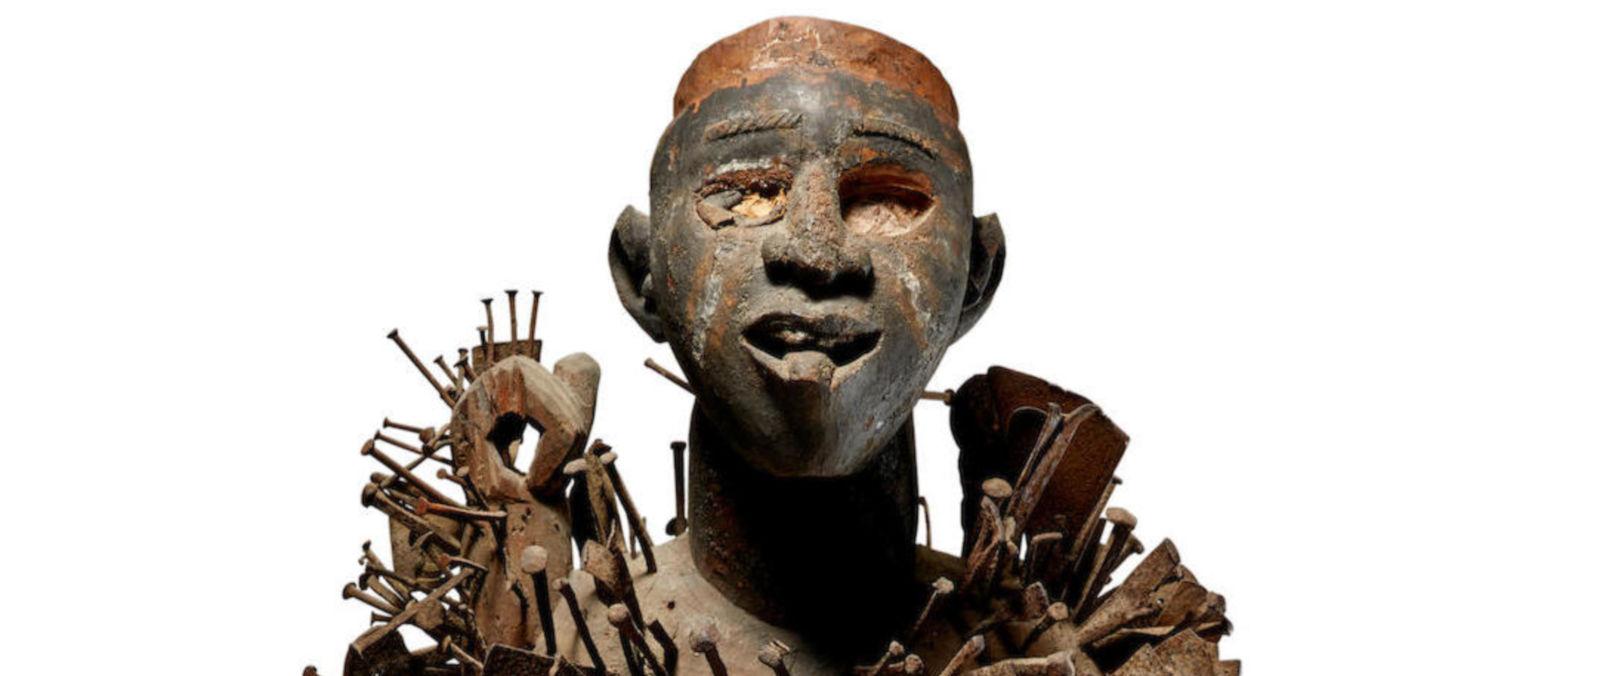 African, Oceanic and Pre-Columbian Art Bonhams